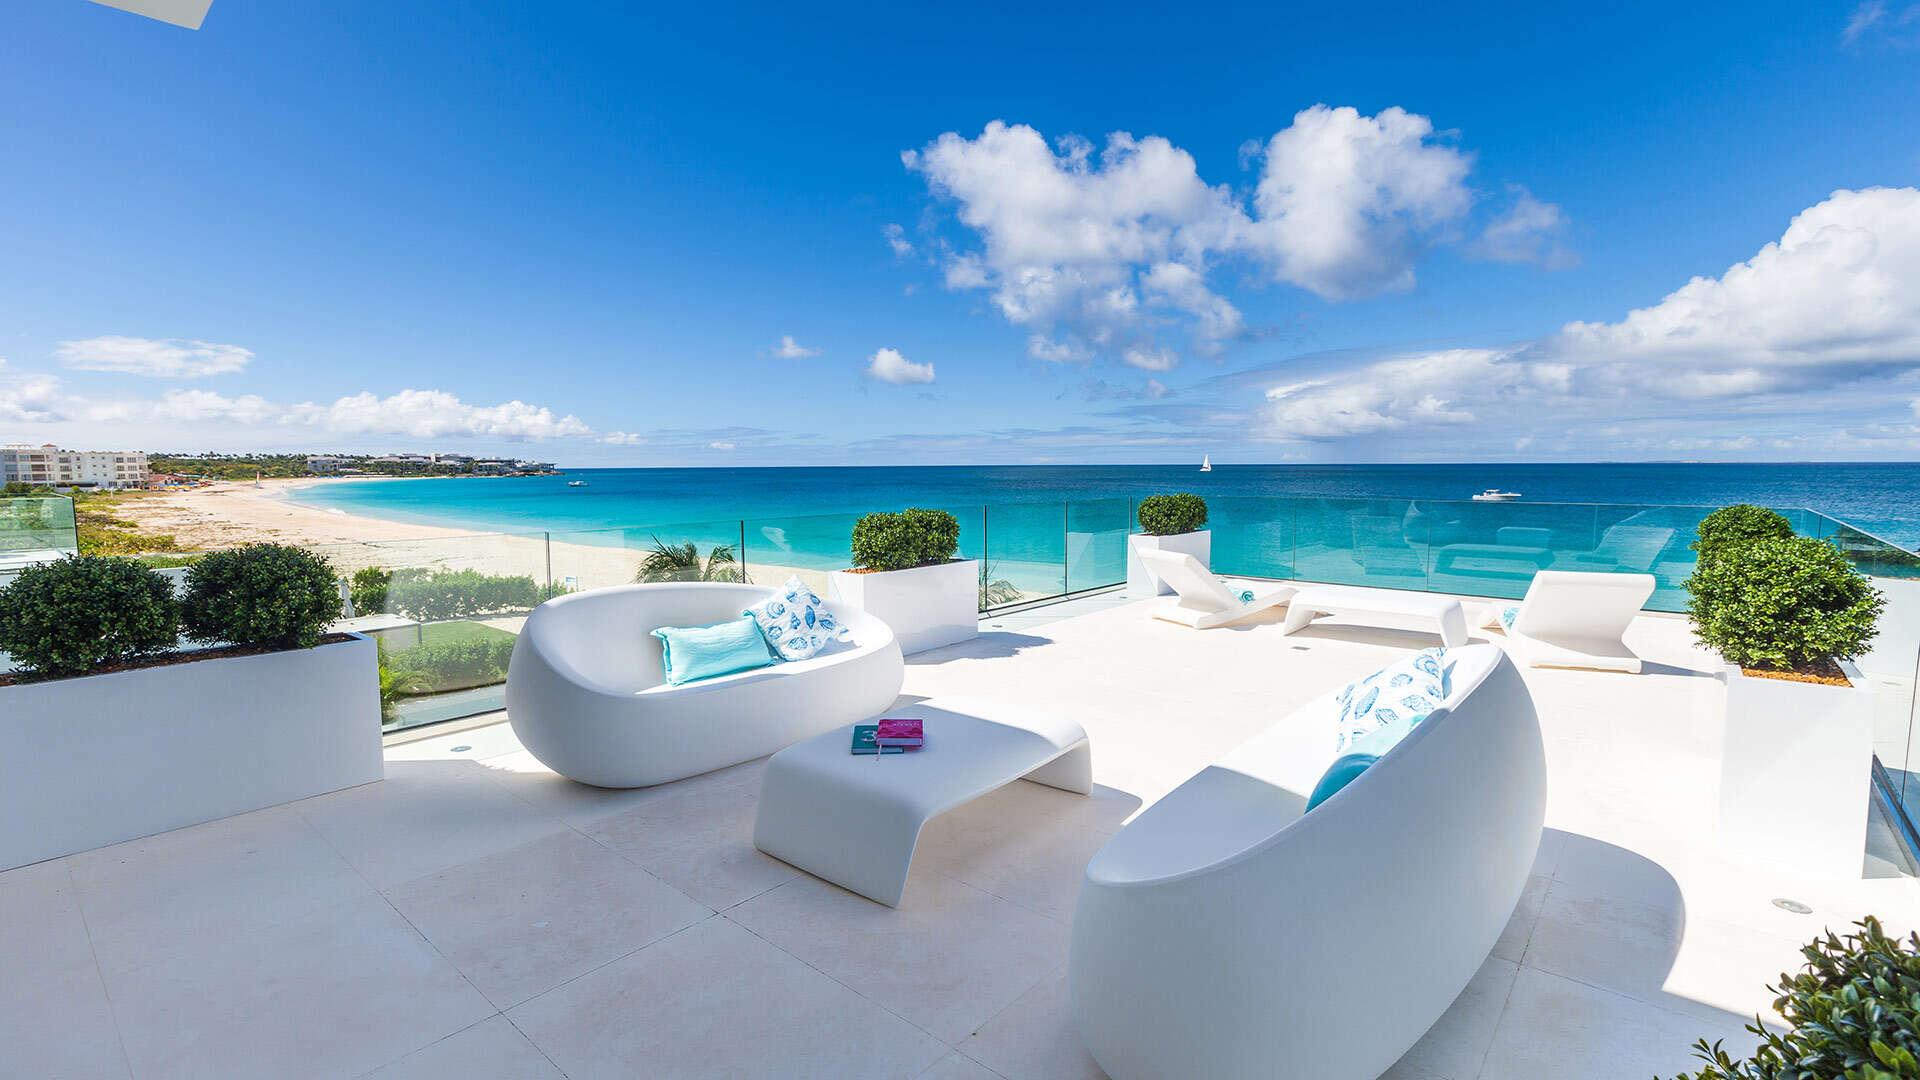 Luxury villa rentals caribbean - Anguilla - Meads bay - No location 4 - Villa Beach House - Image 1/27